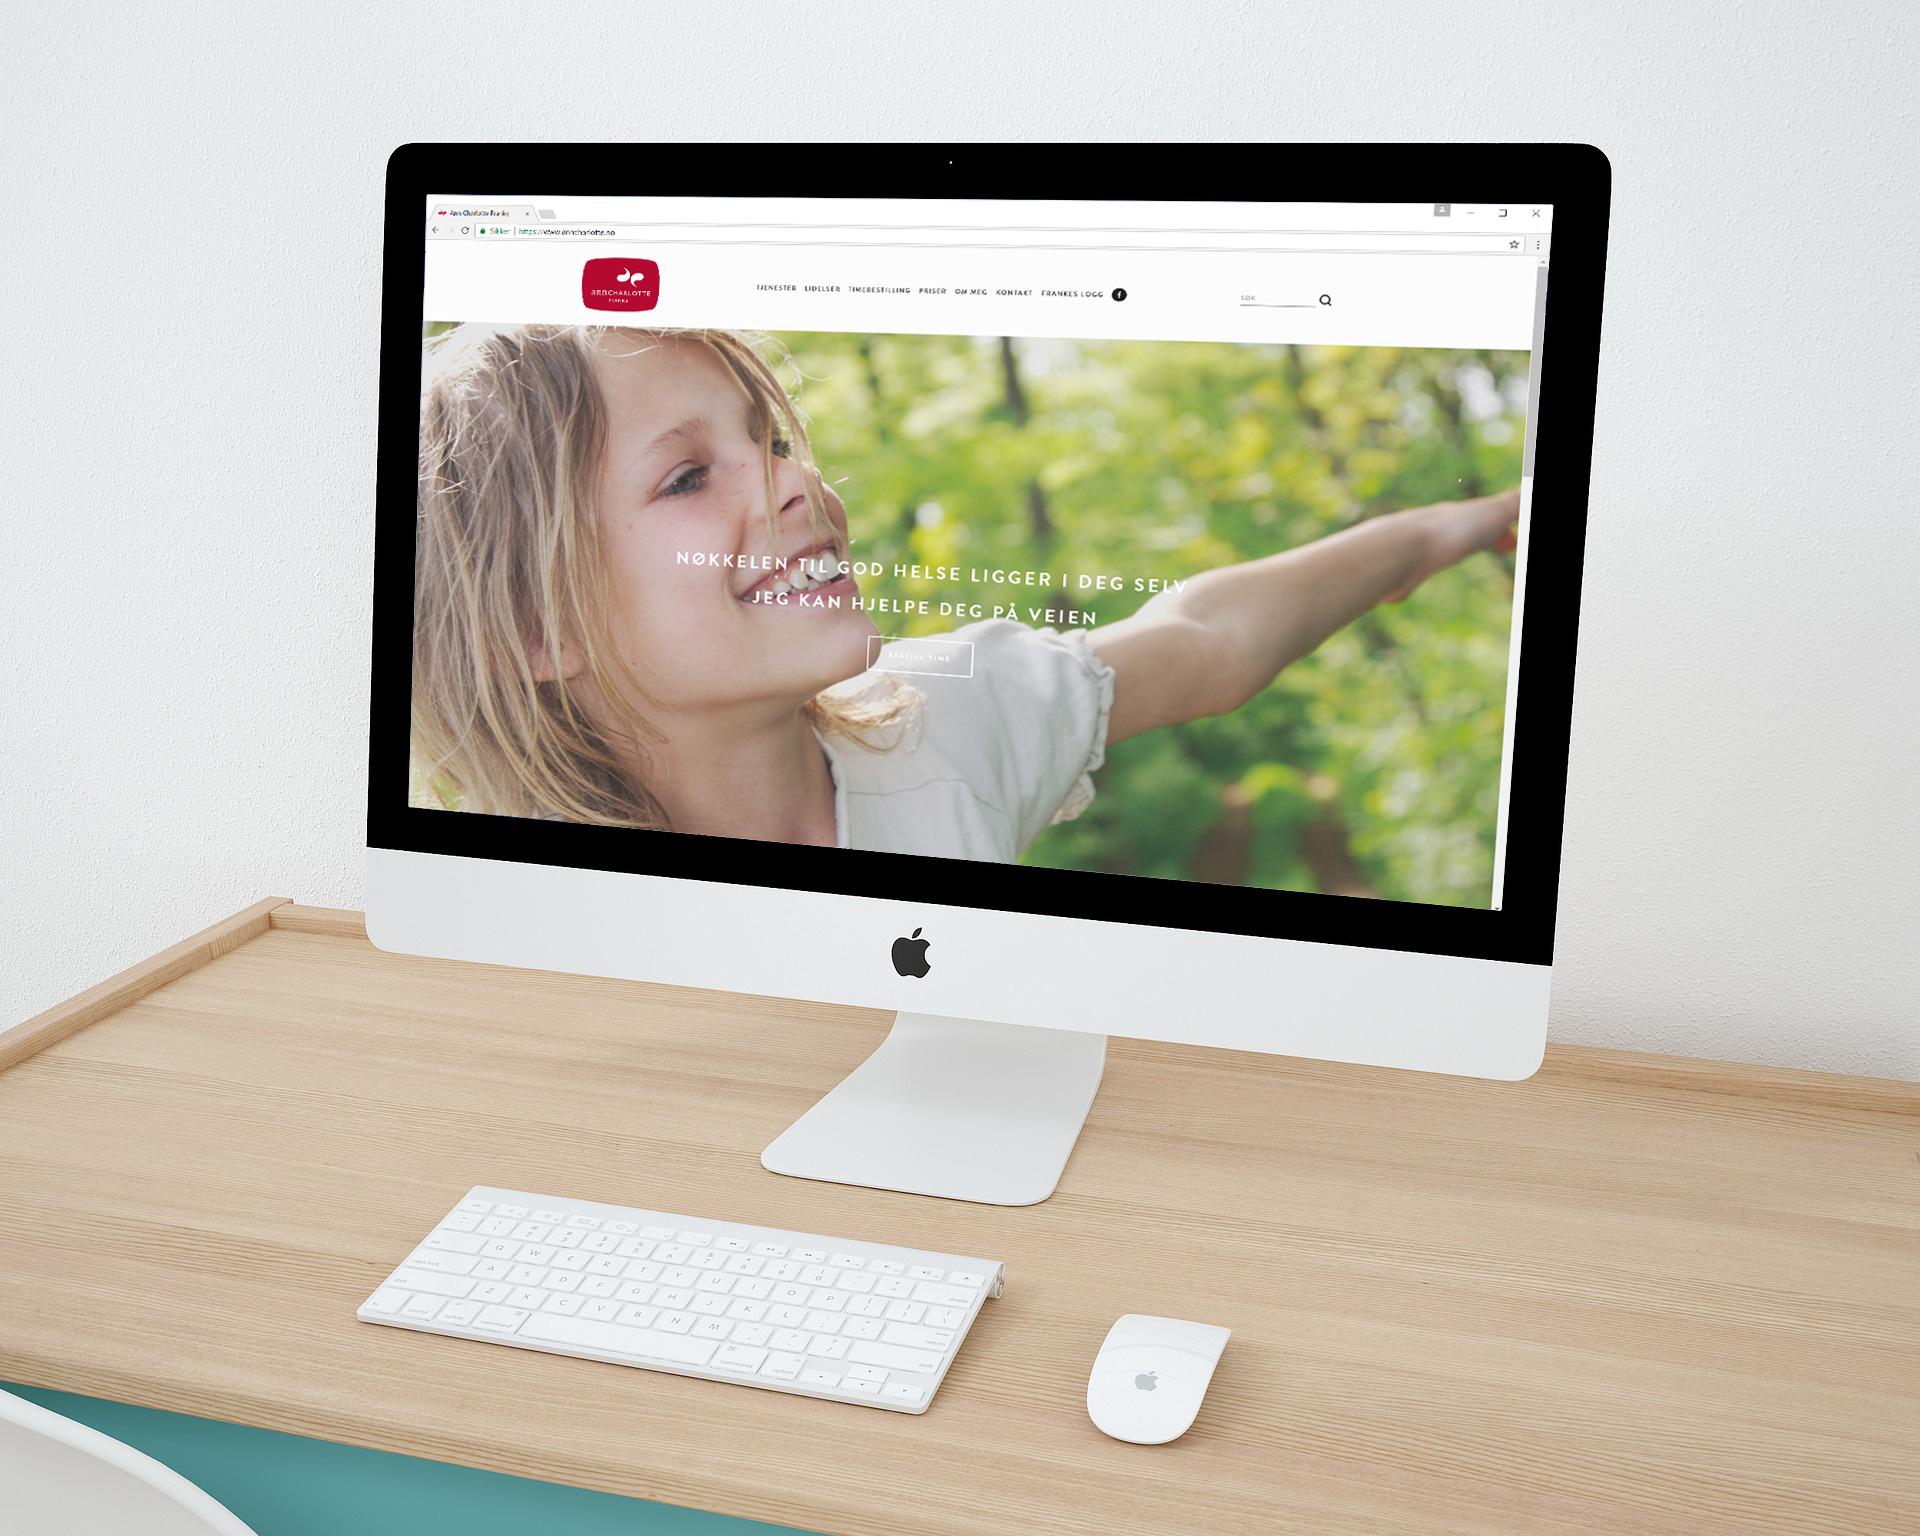 web-design-anncharlotte.jpg